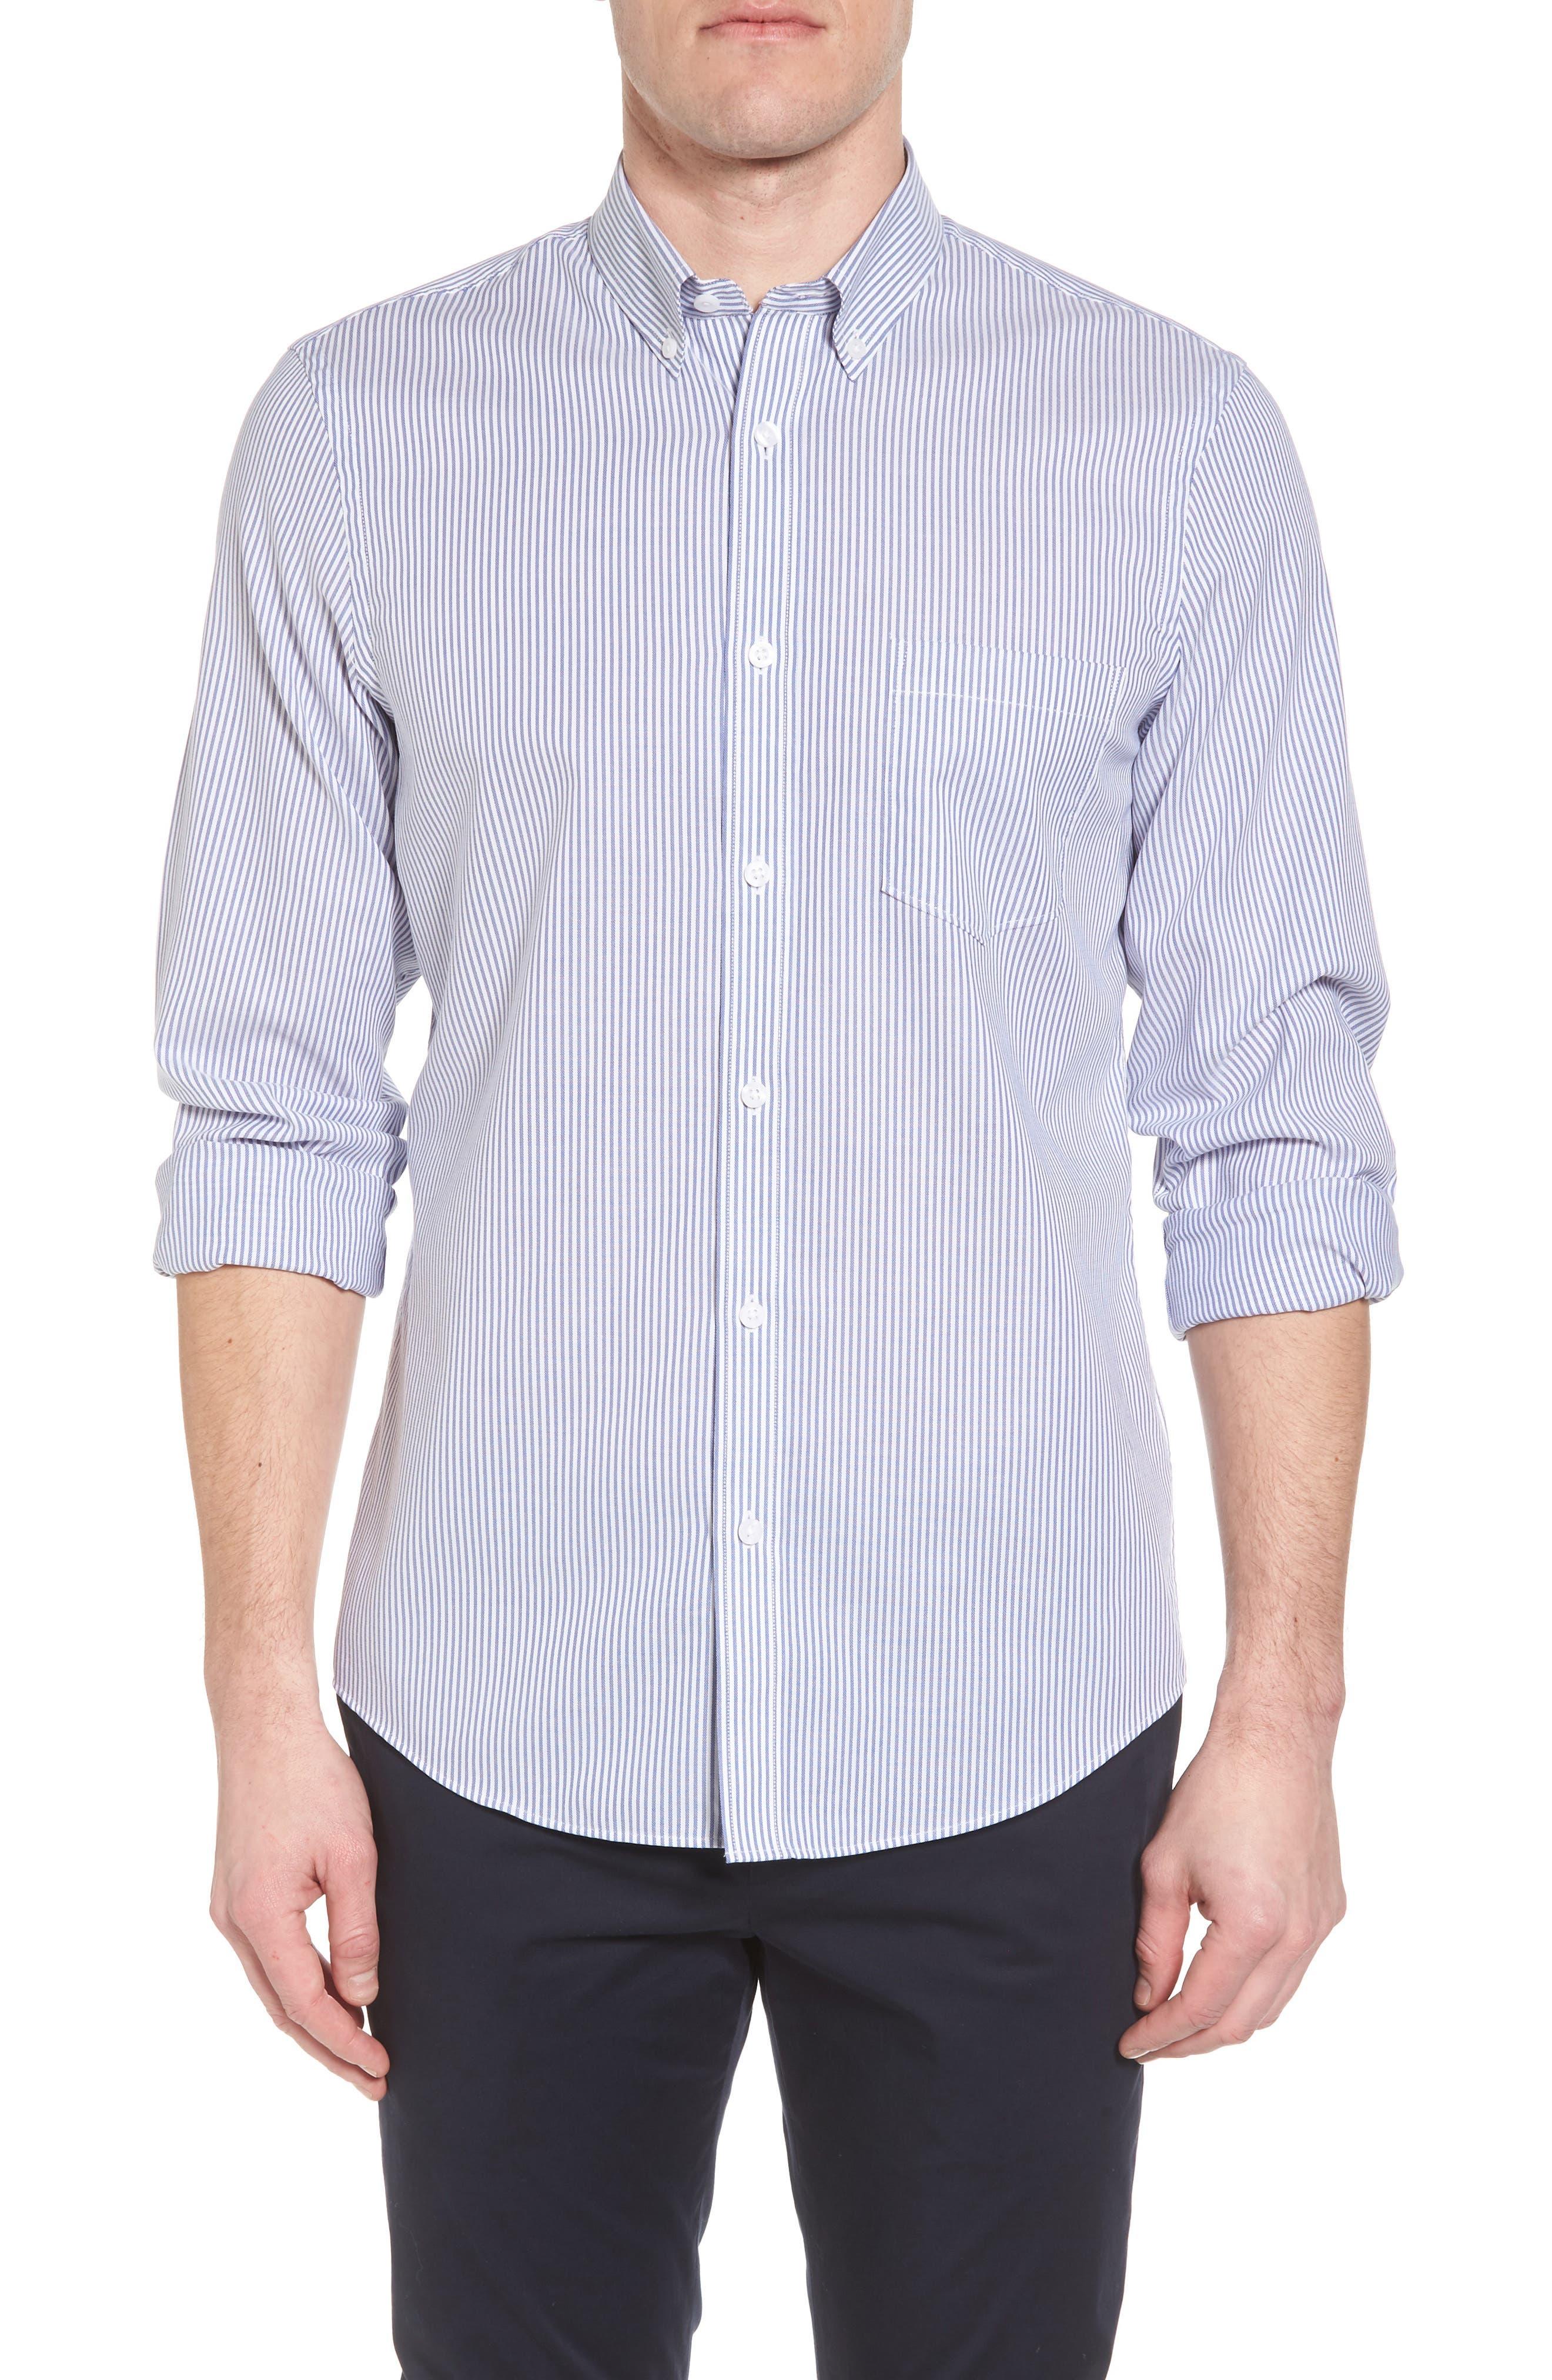 Tech-Smart Regular Fit Stripe Sport Shirt,                             Main thumbnail 1, color,                             Navy Iris White Stripe